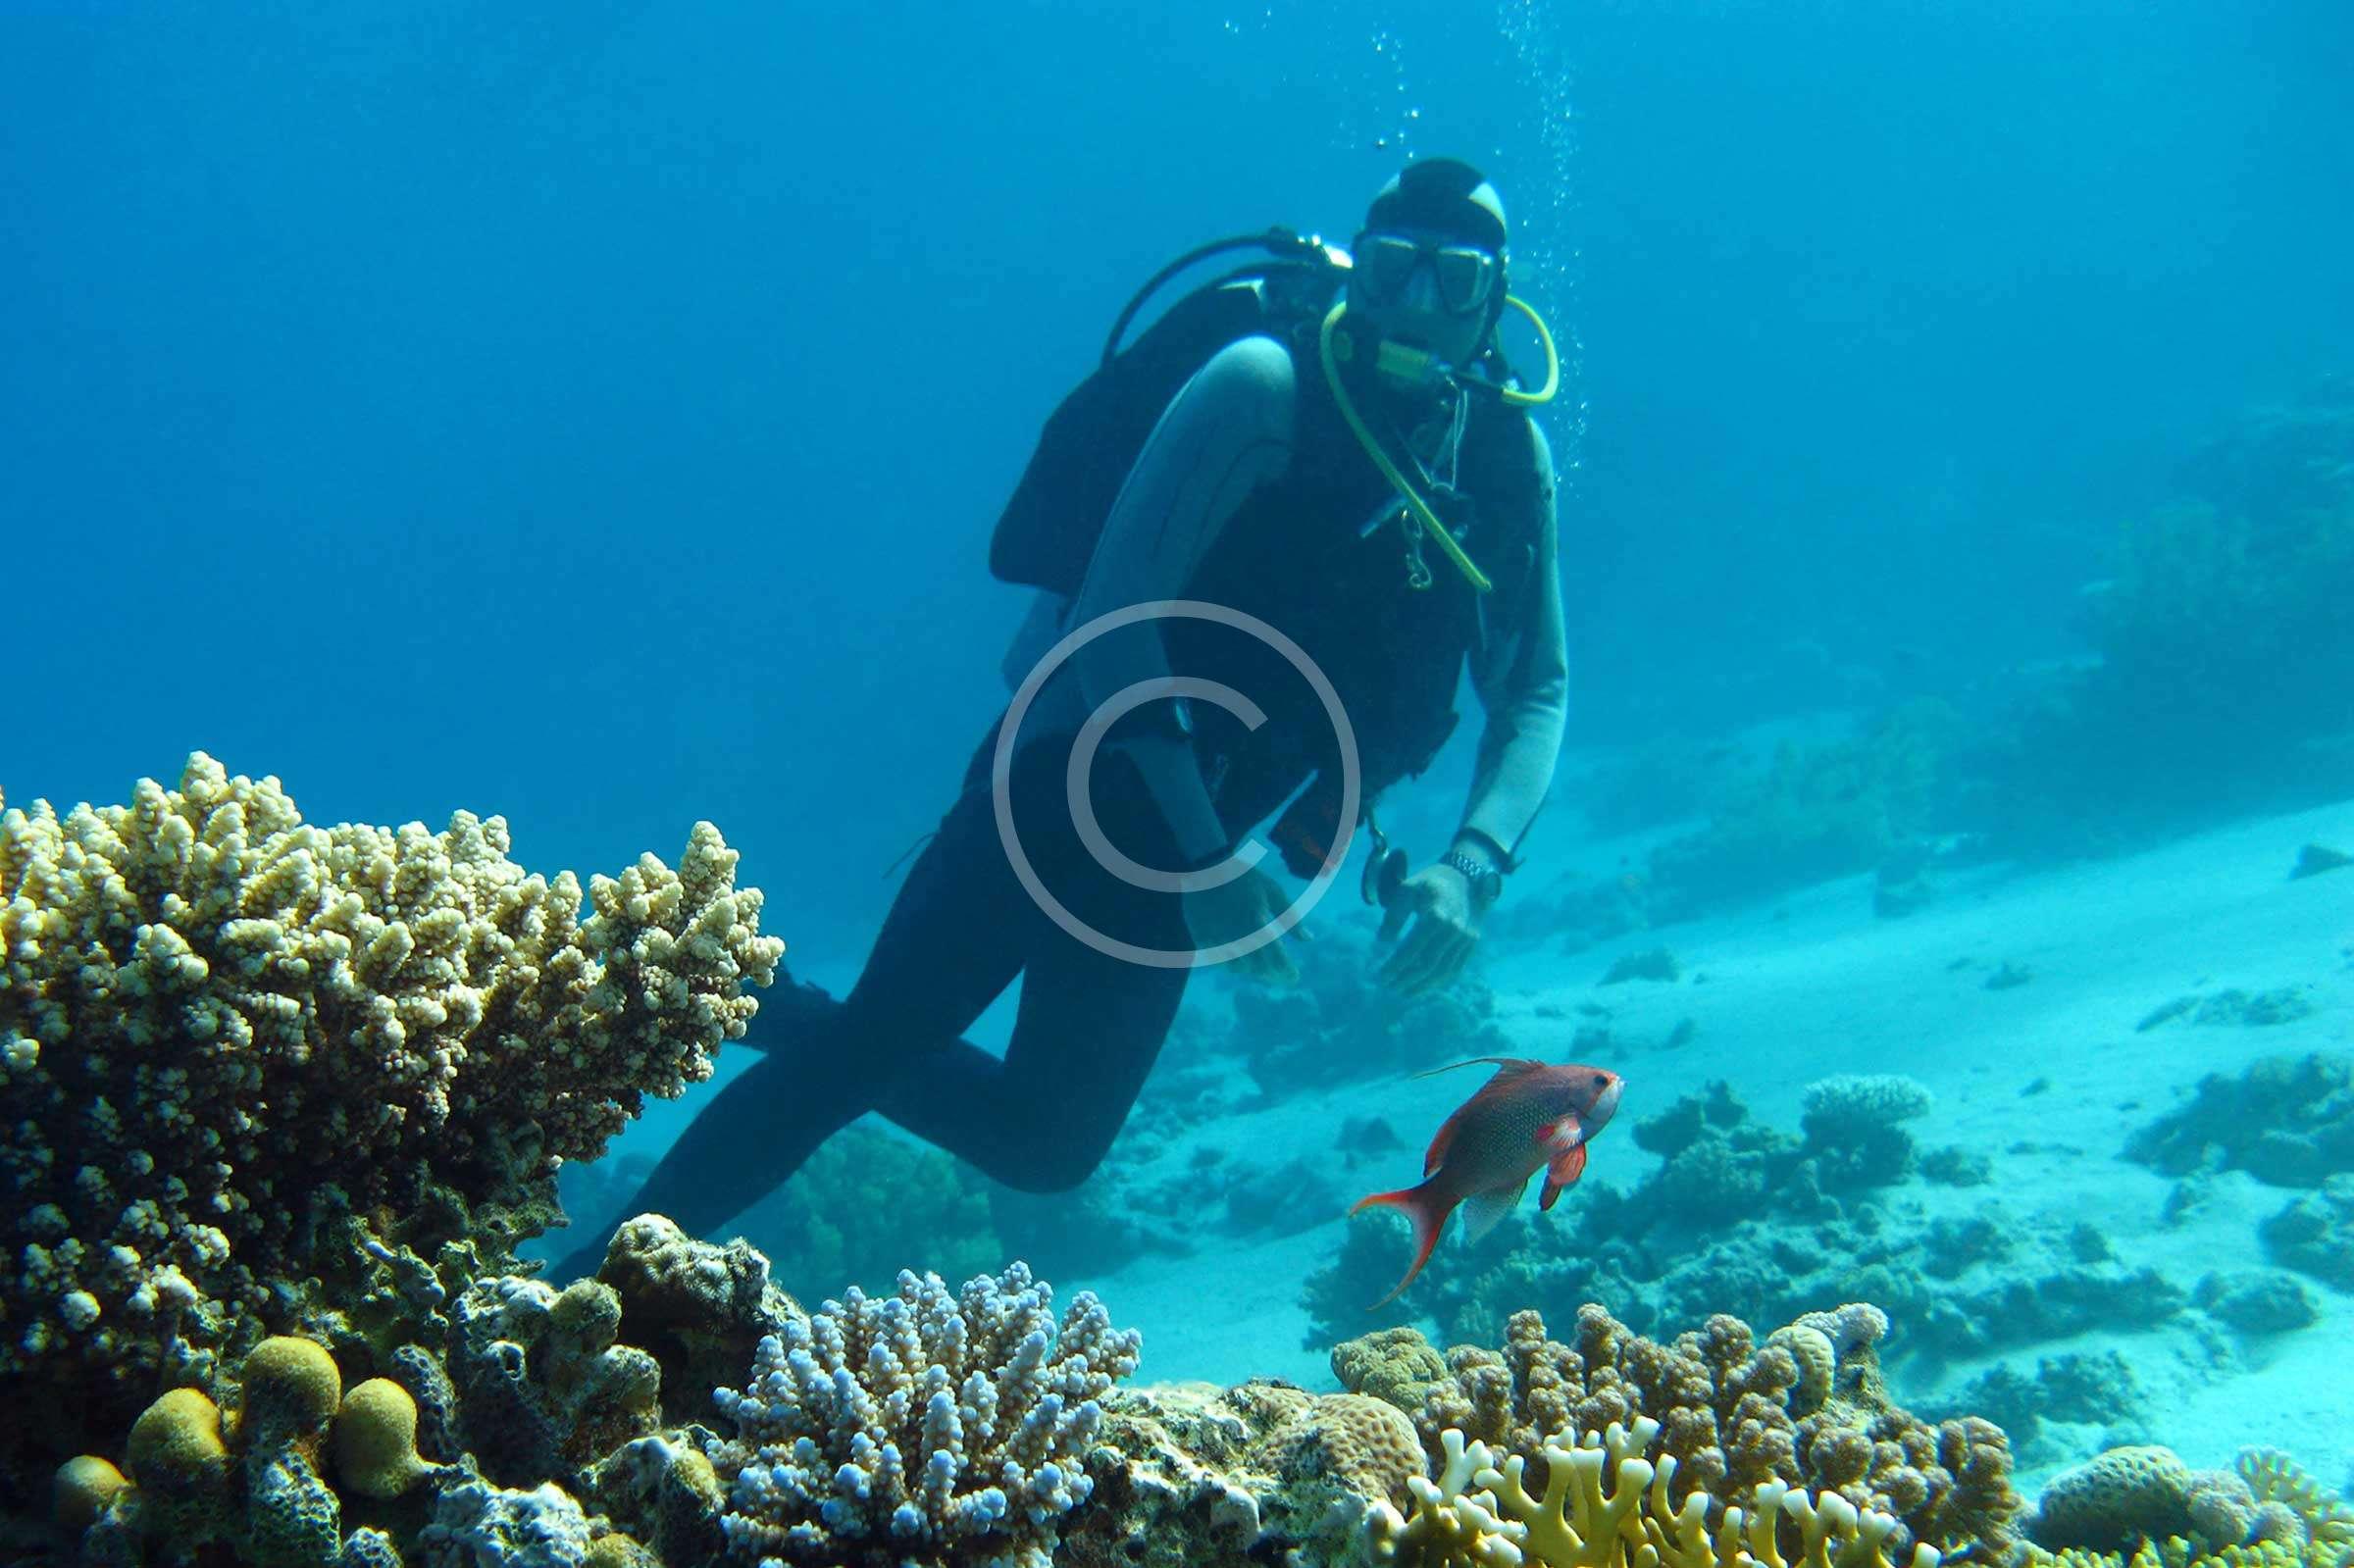 Underwater Family Photoshoot